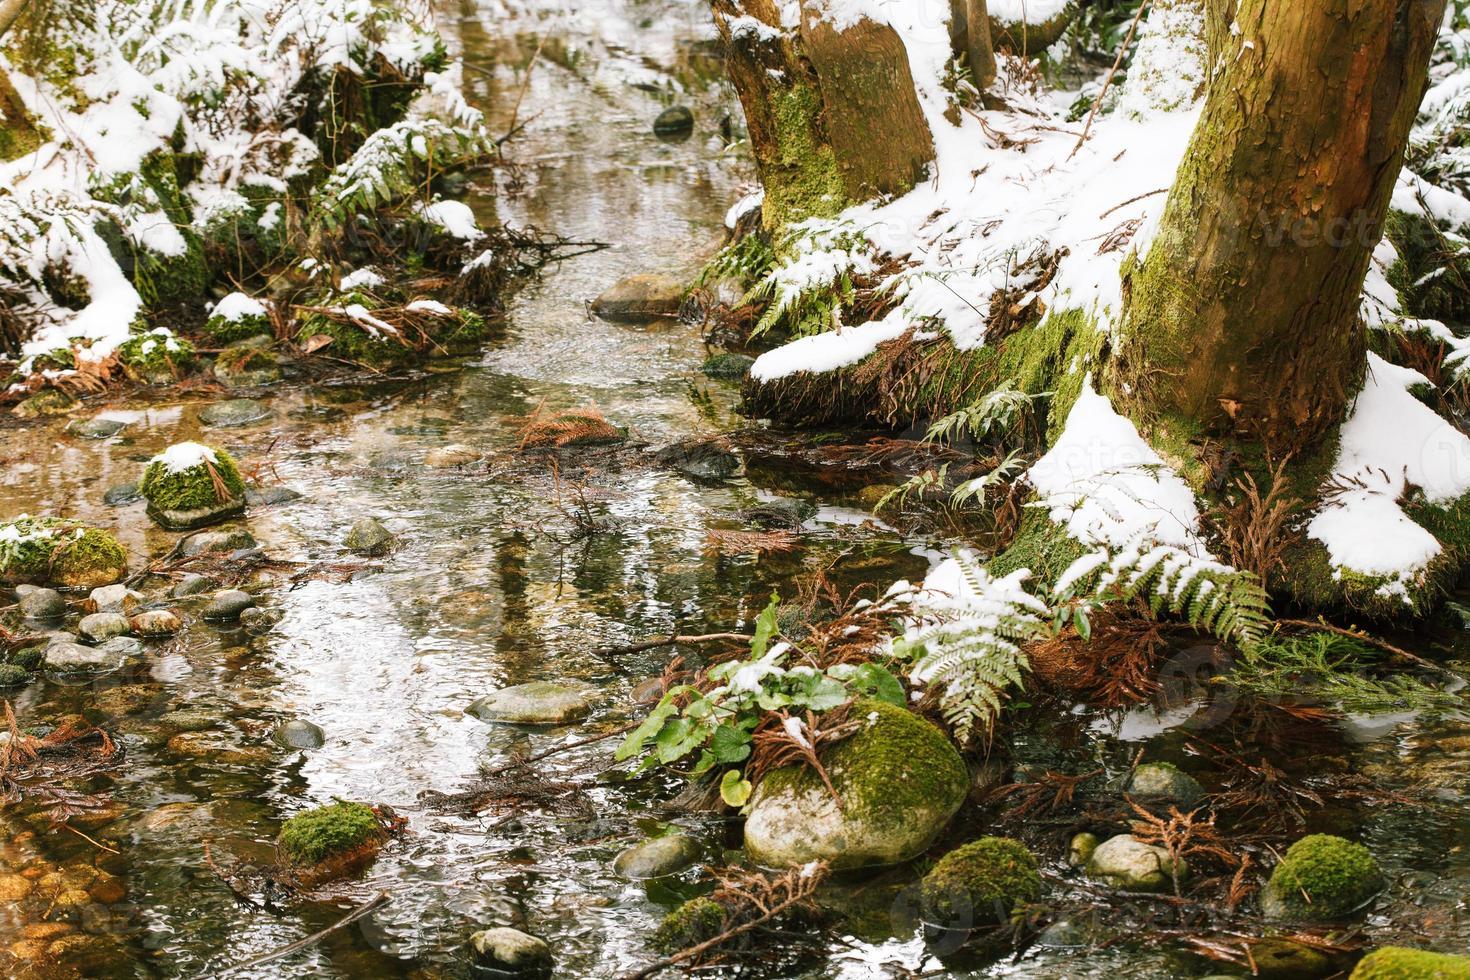 riacho na floresta de inverno foto